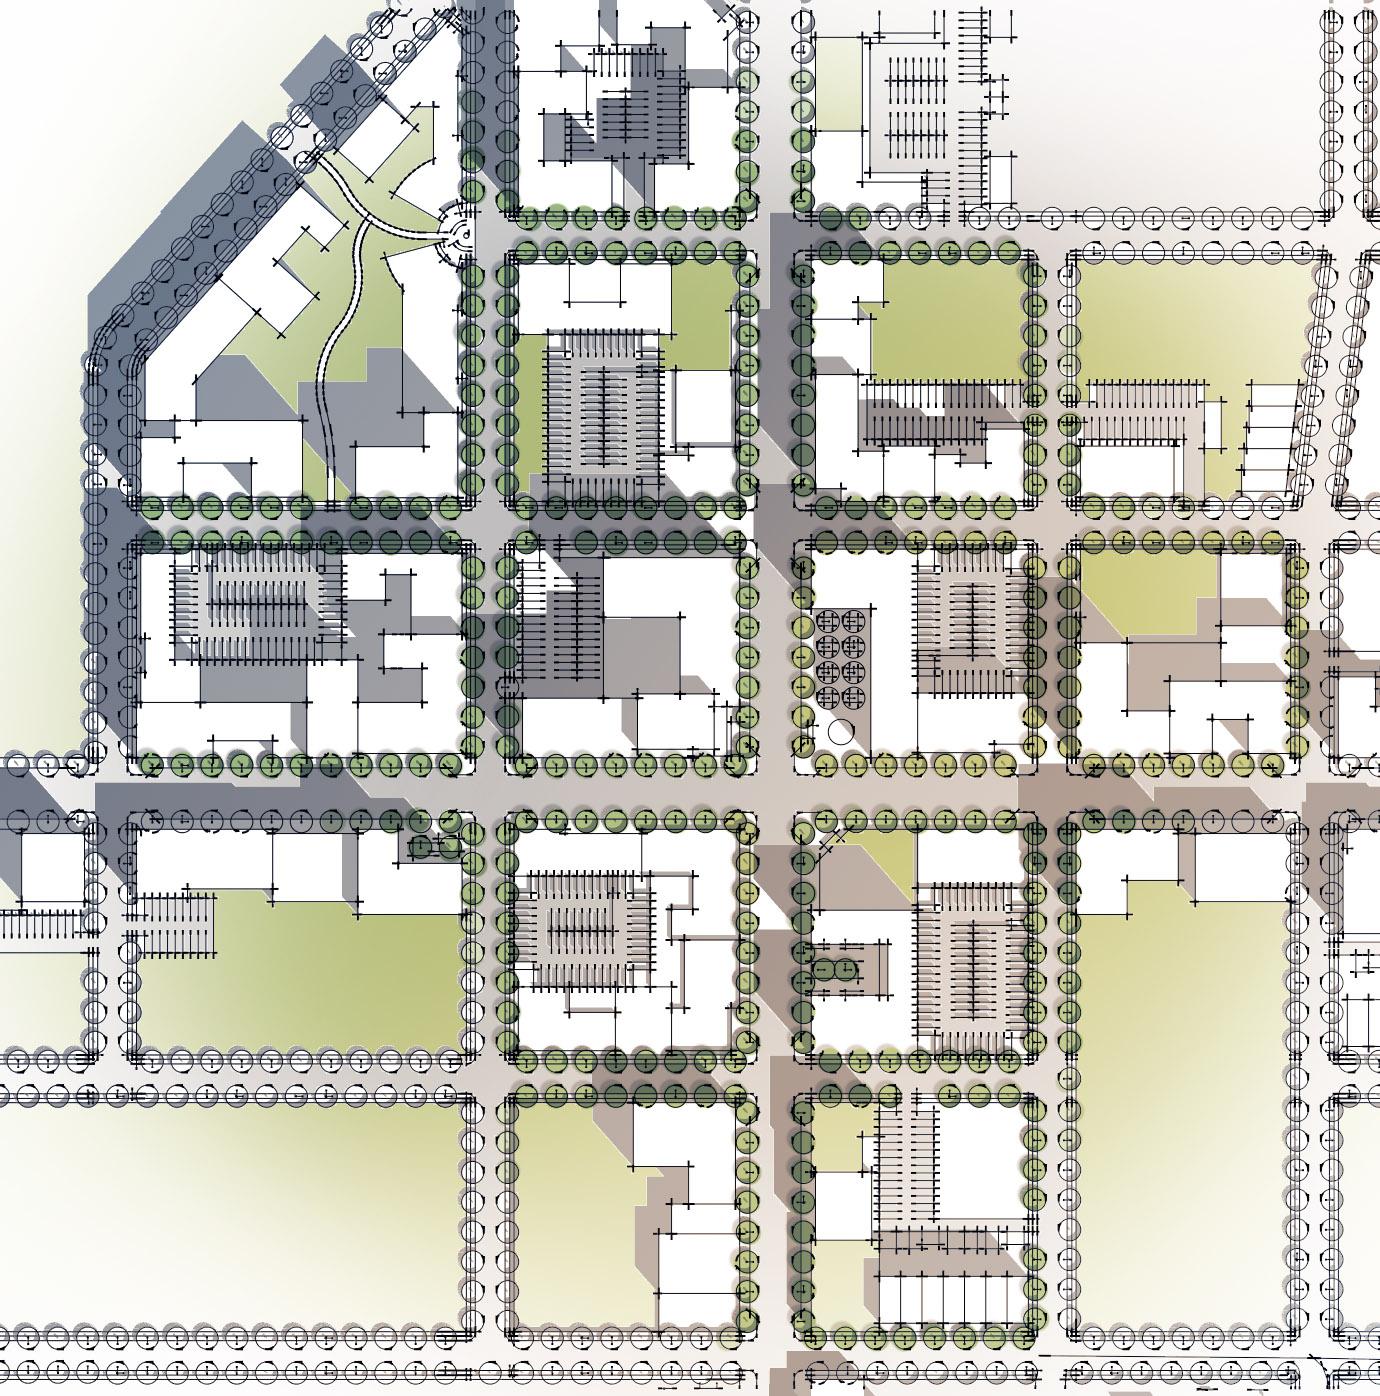 Utah Home Design Architects: BOISE'S BENCH